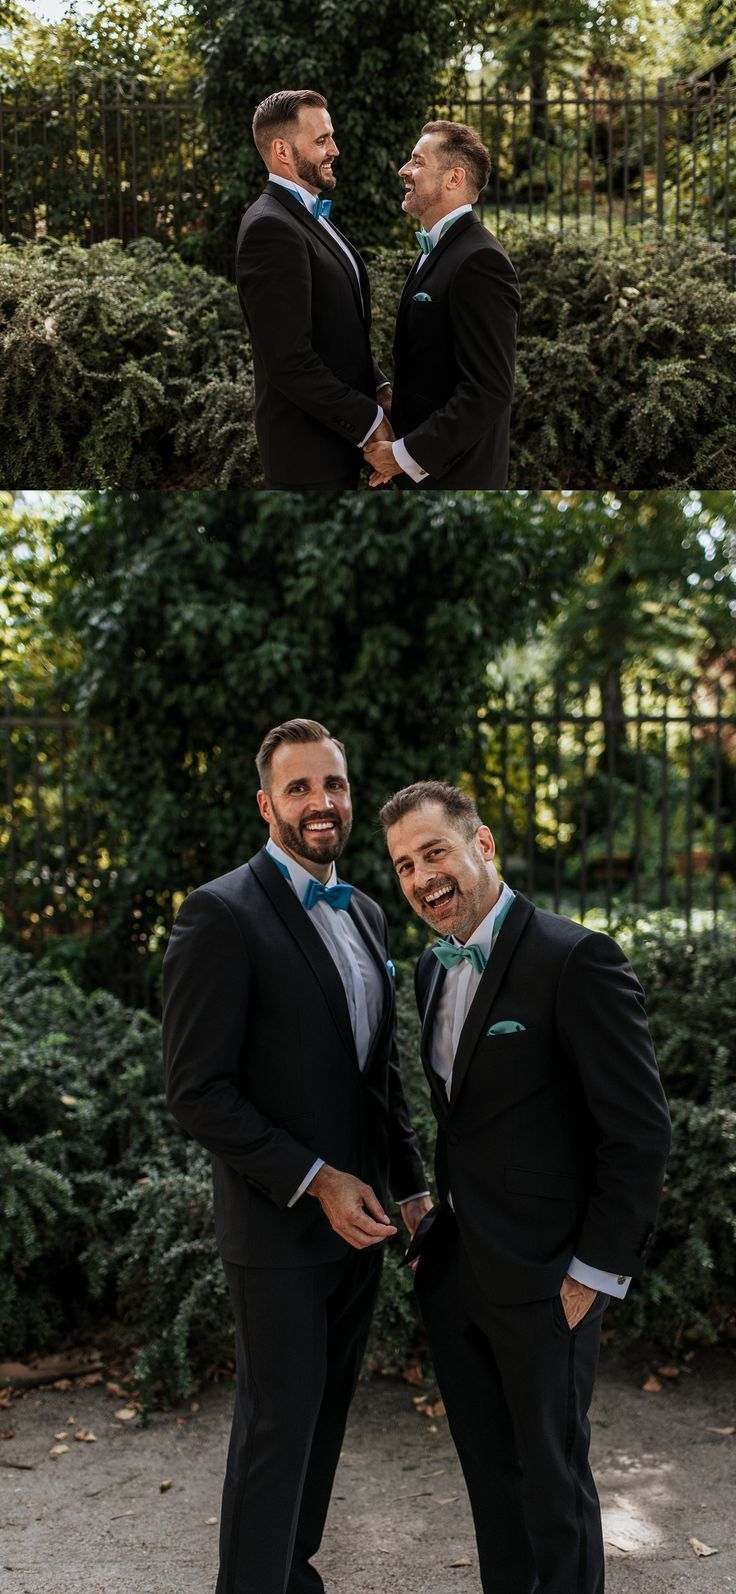 Pin Auf Gay Weddings